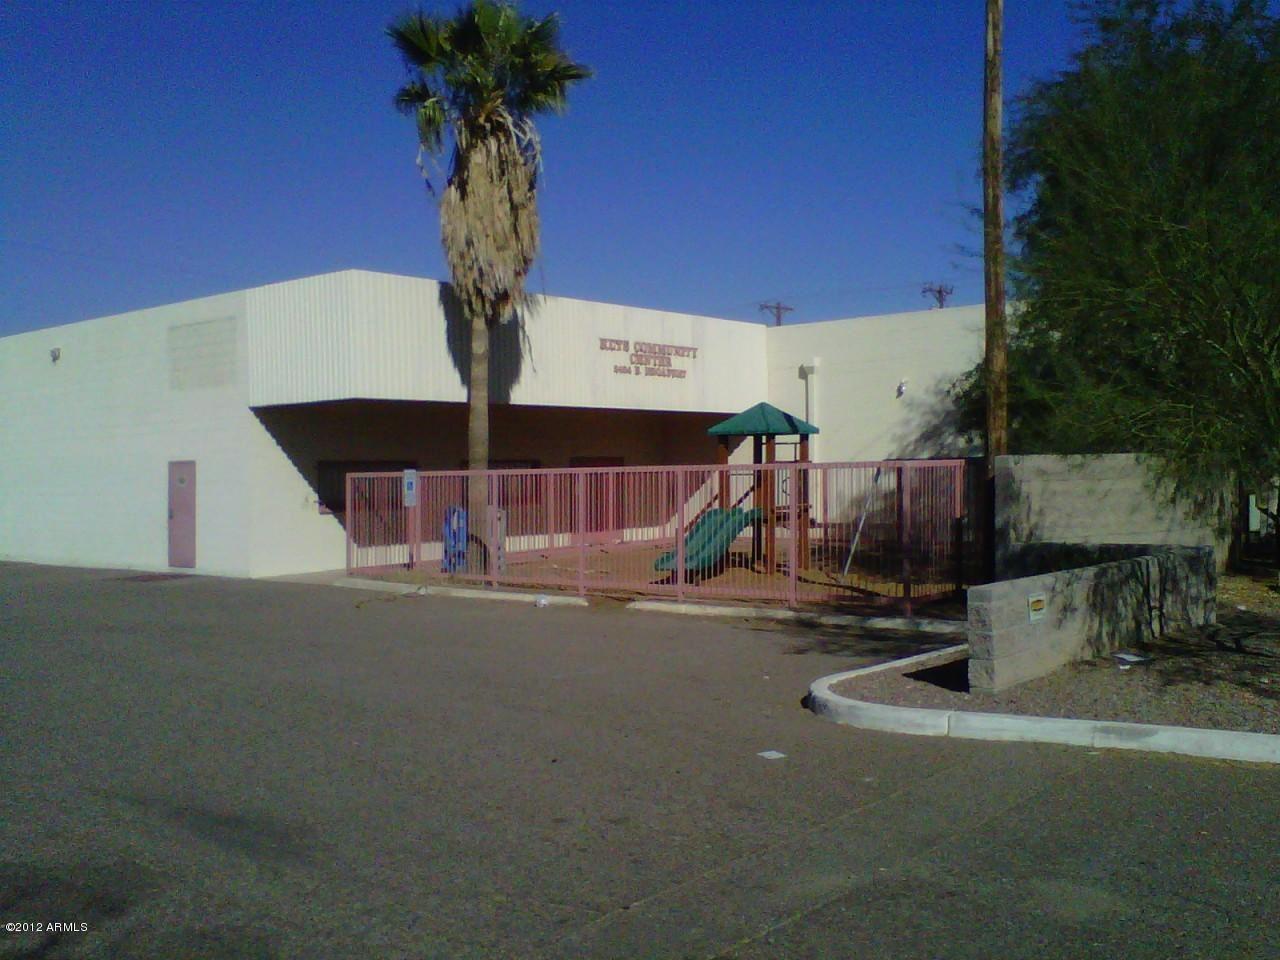 Charter Private School For Sale Phoenix AZ Kids daycare